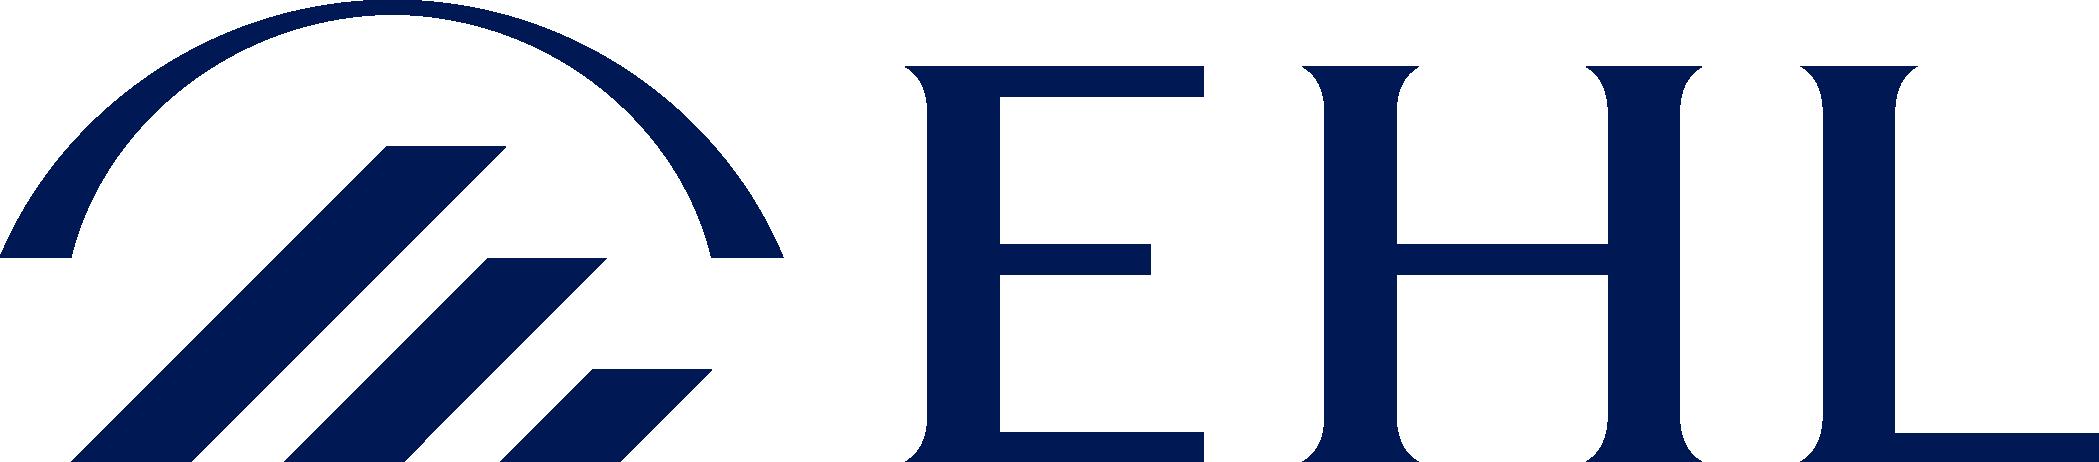 EHL2021泛酒店业创新挑战赛 - 中国站